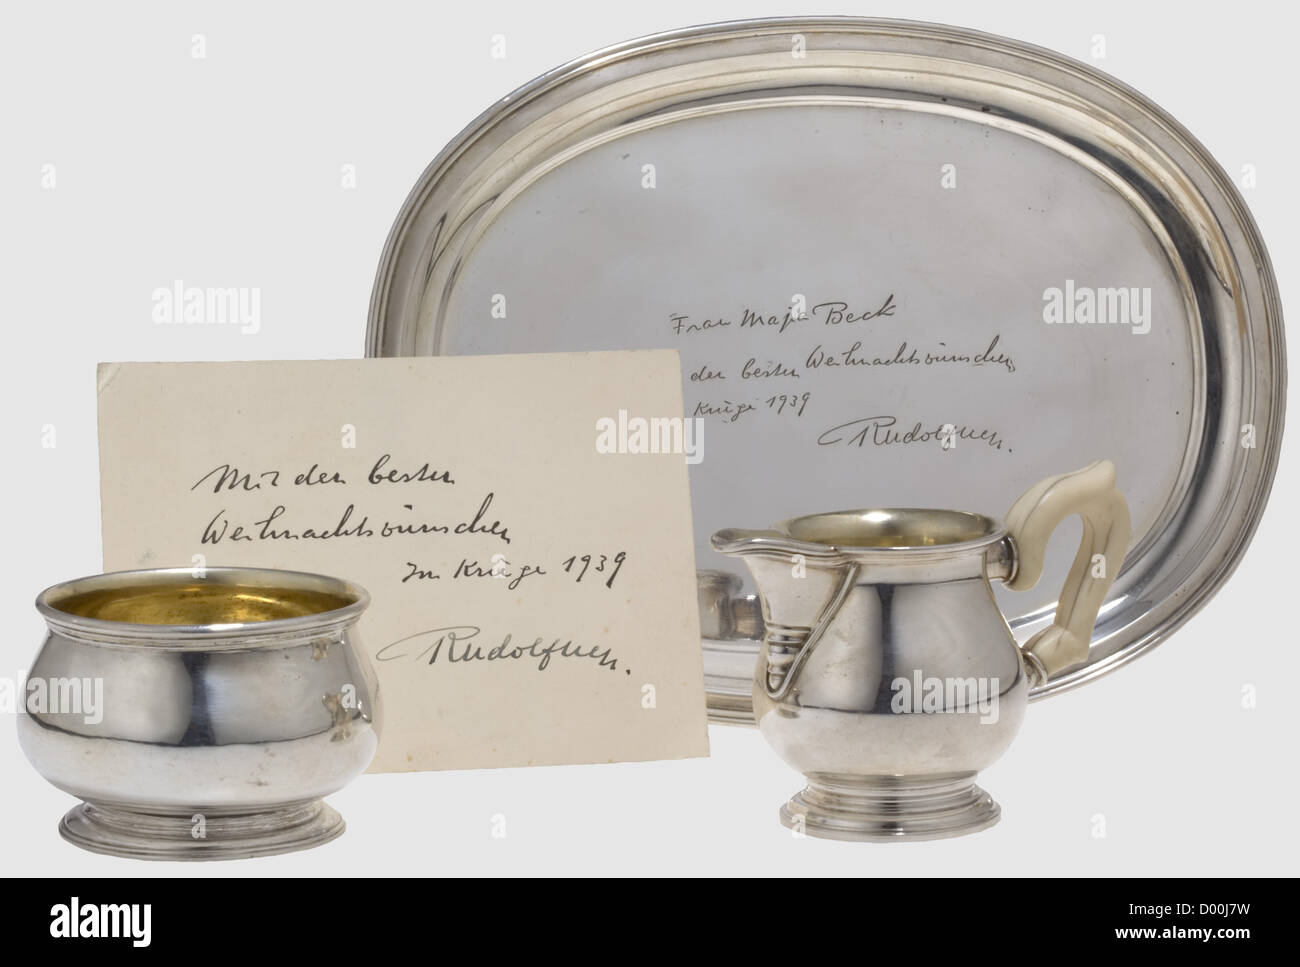 Engraving Bowl Stock Photos & Engraving Bowl Stock Images - Alamy